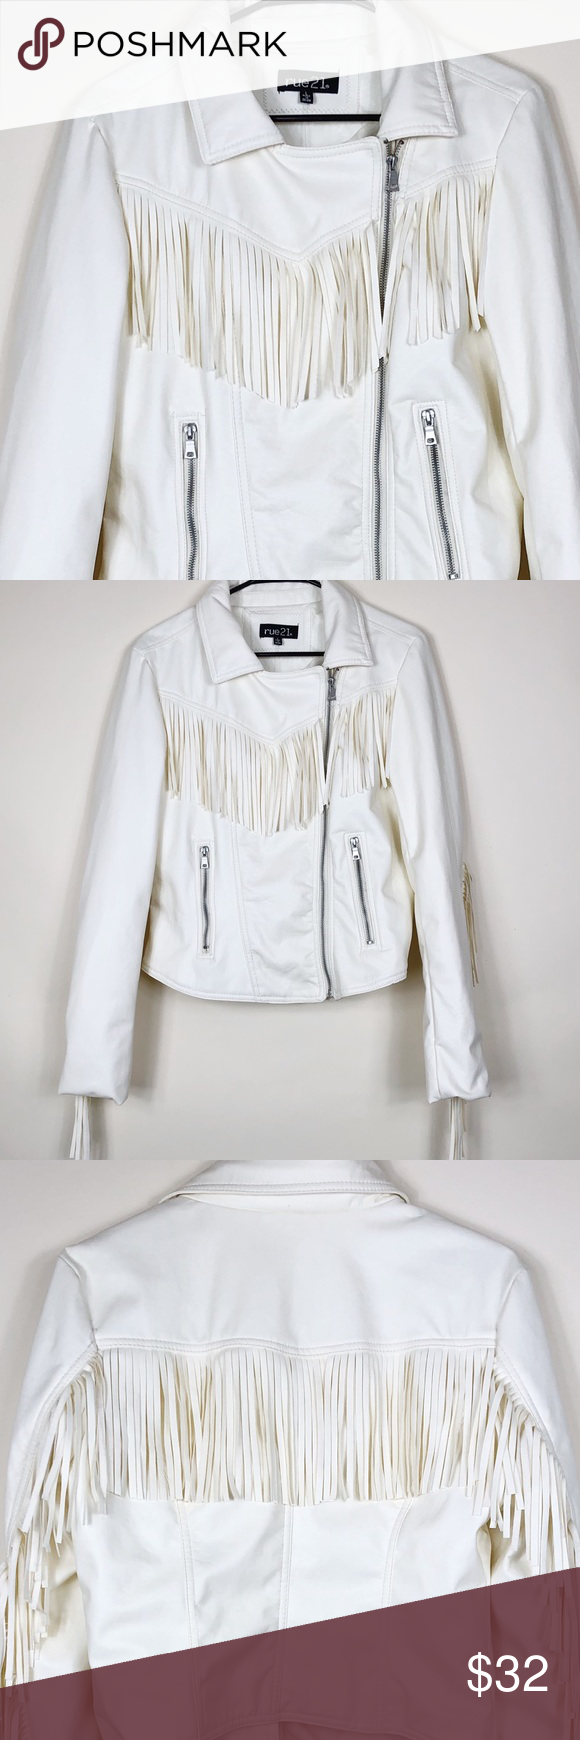 Rue21 off white faux leather fringe jacket. Size L